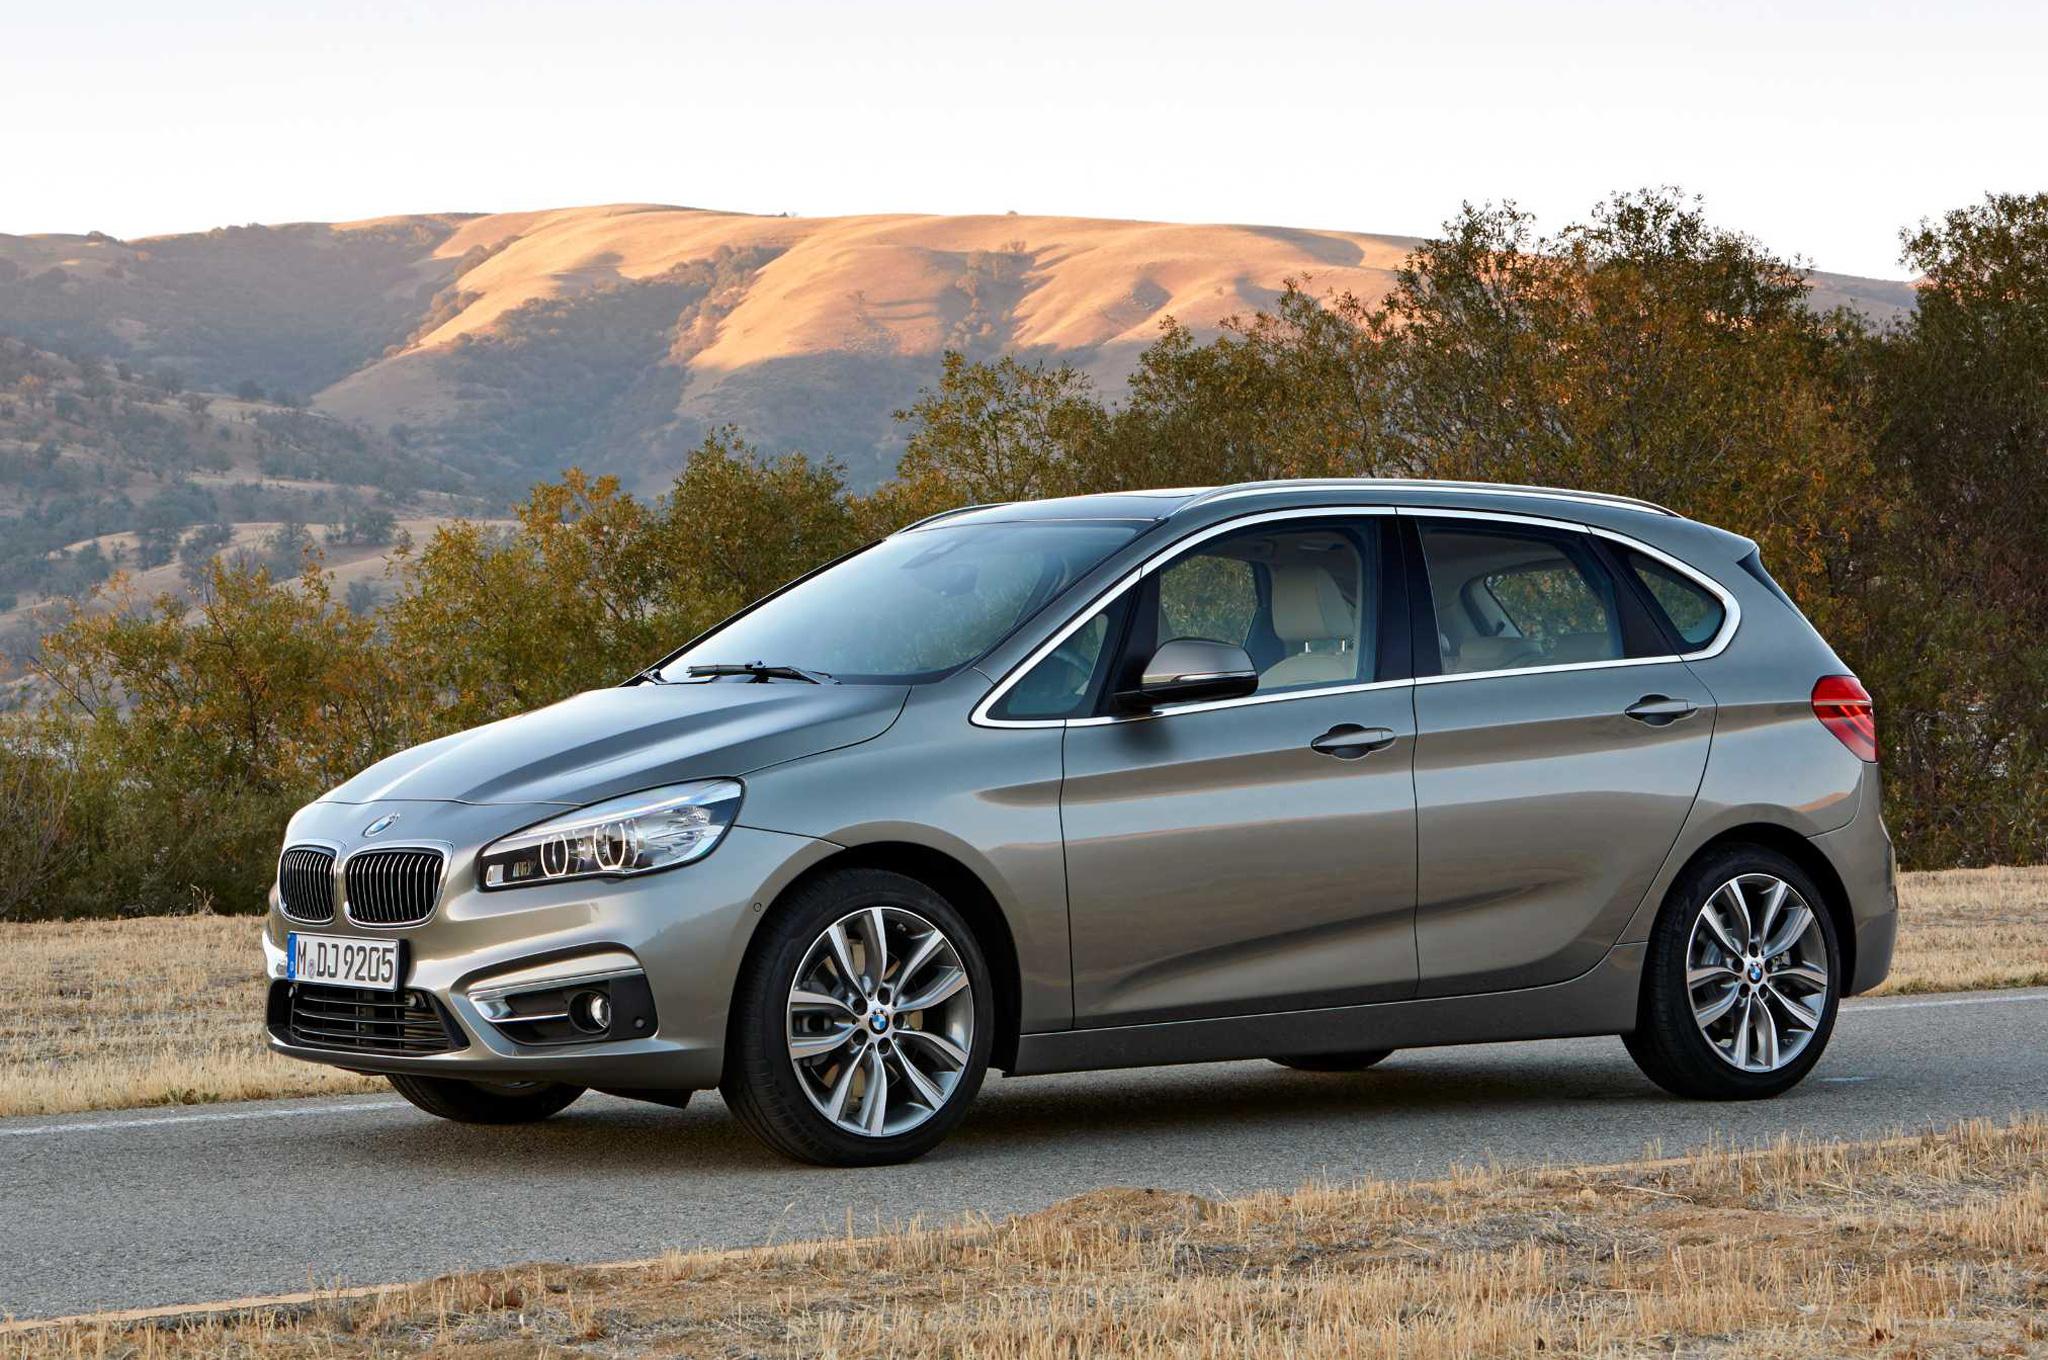 Photo of BMW'de %0 faiz fırsatı